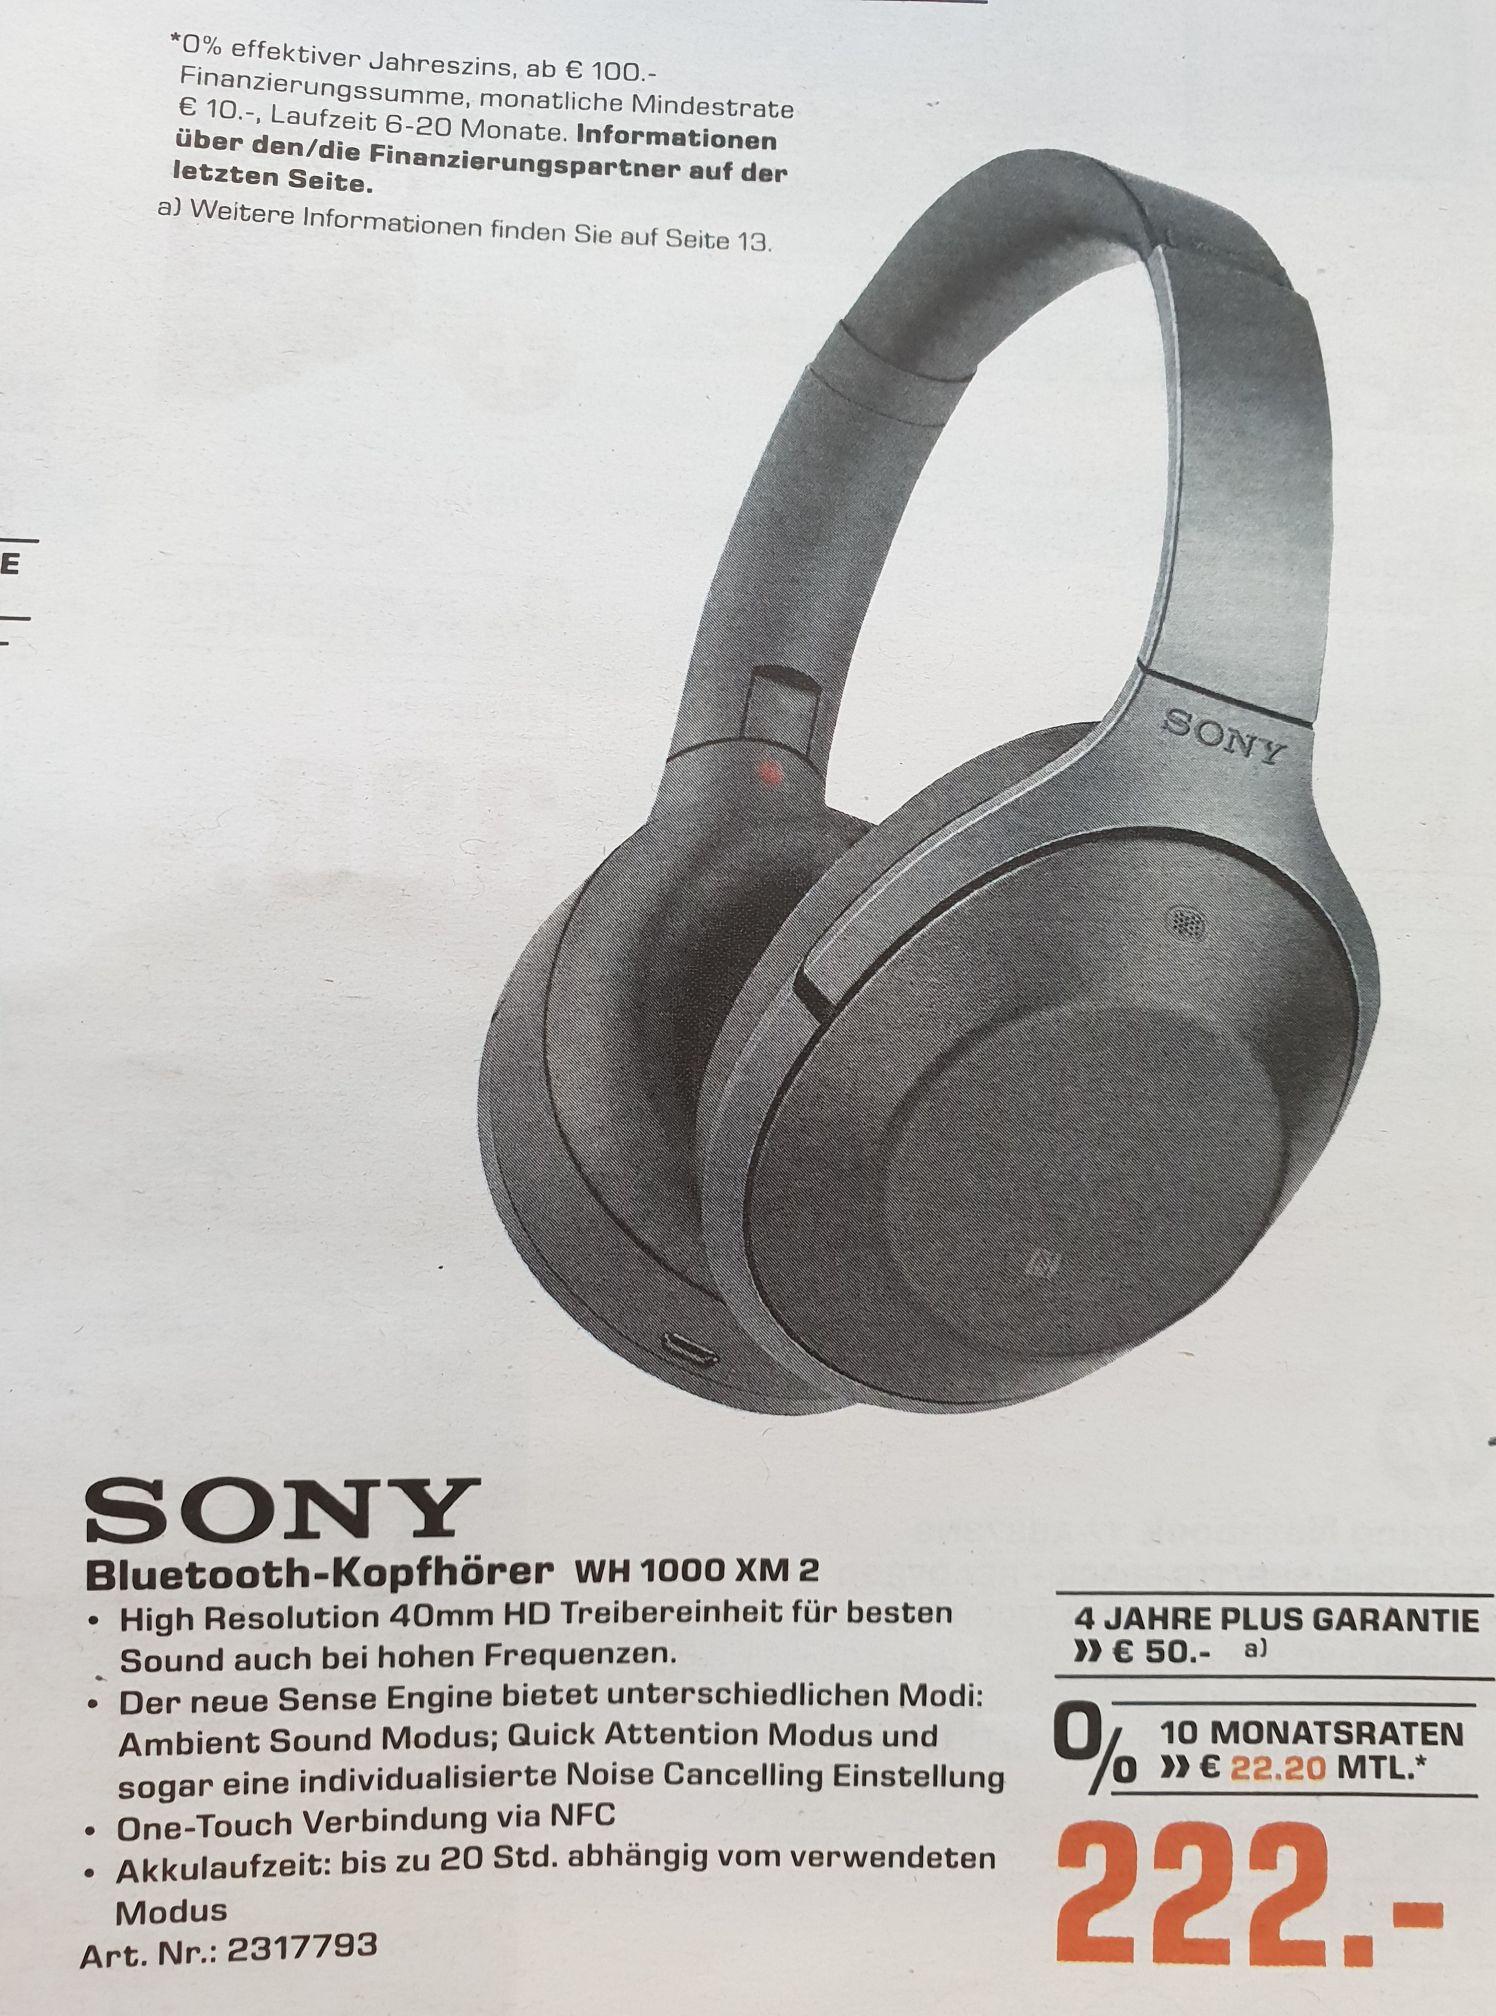 (Lokal) Sony WH 1000 XM 2 NC Kopfhörer offline @ Saturn Karlsruhe